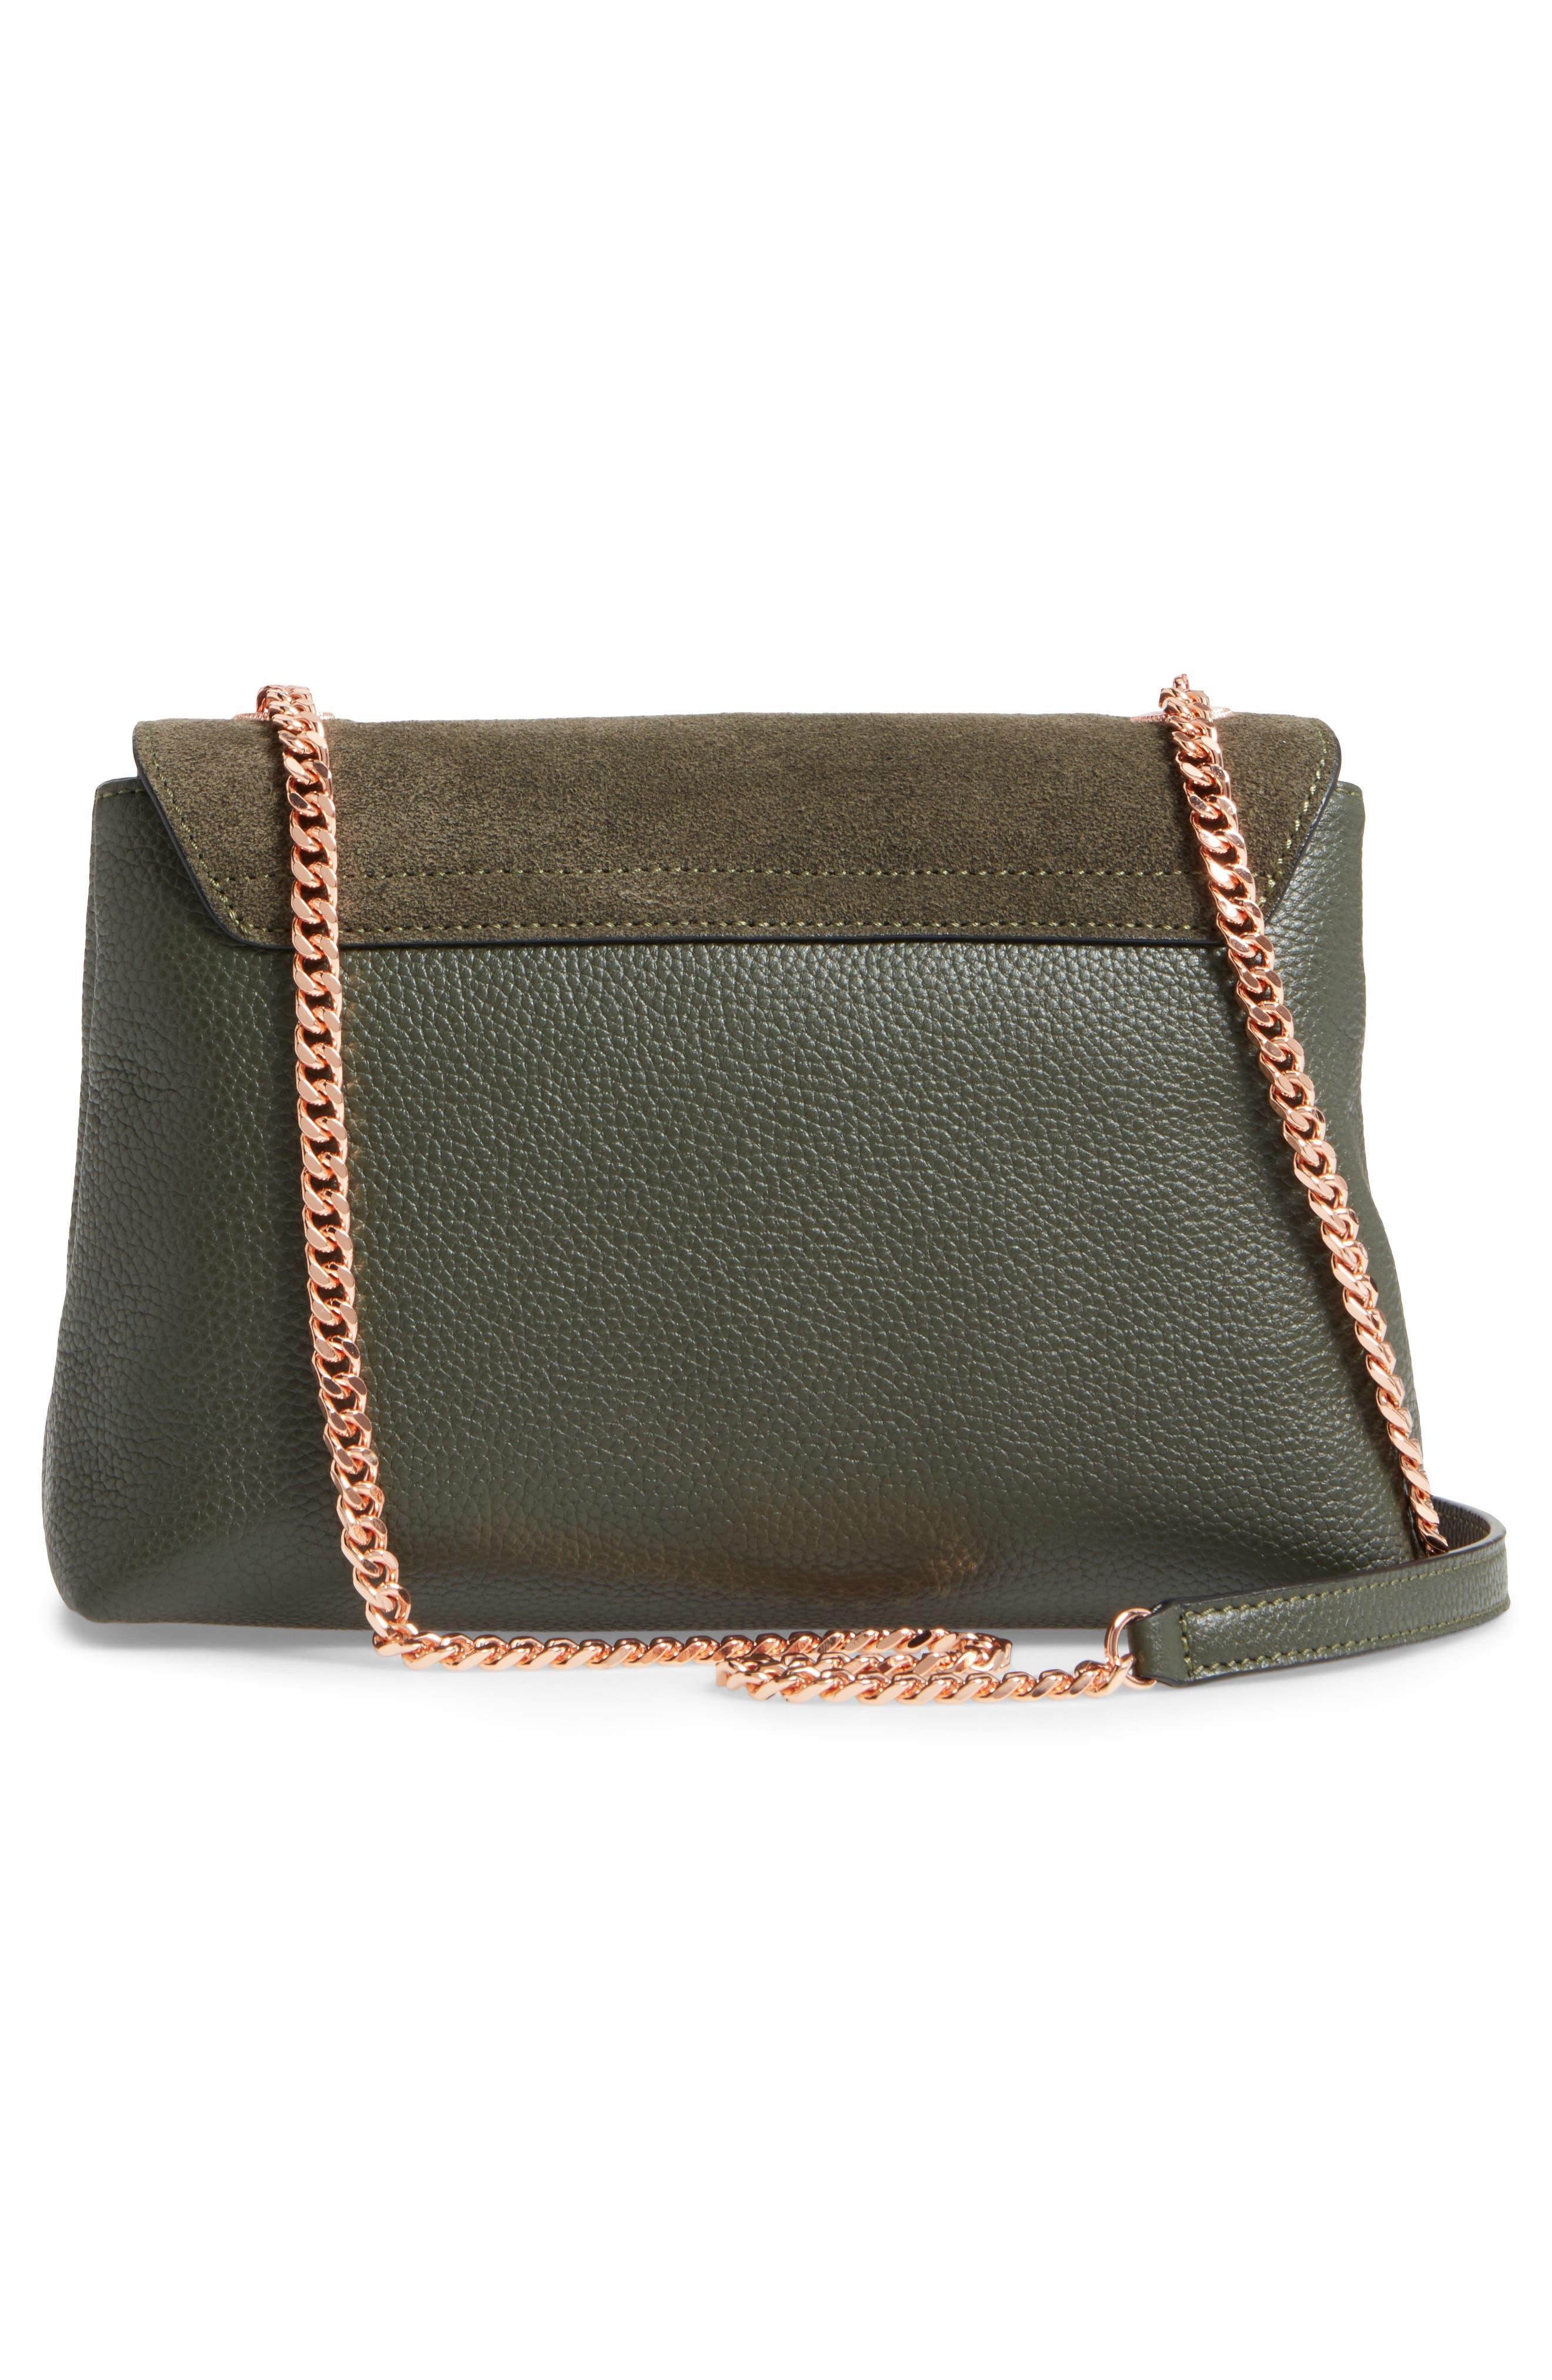 Sorikai Leather & Suede Crossbody Bag,                             Alternate thumbnail 2, color,                             Khaki